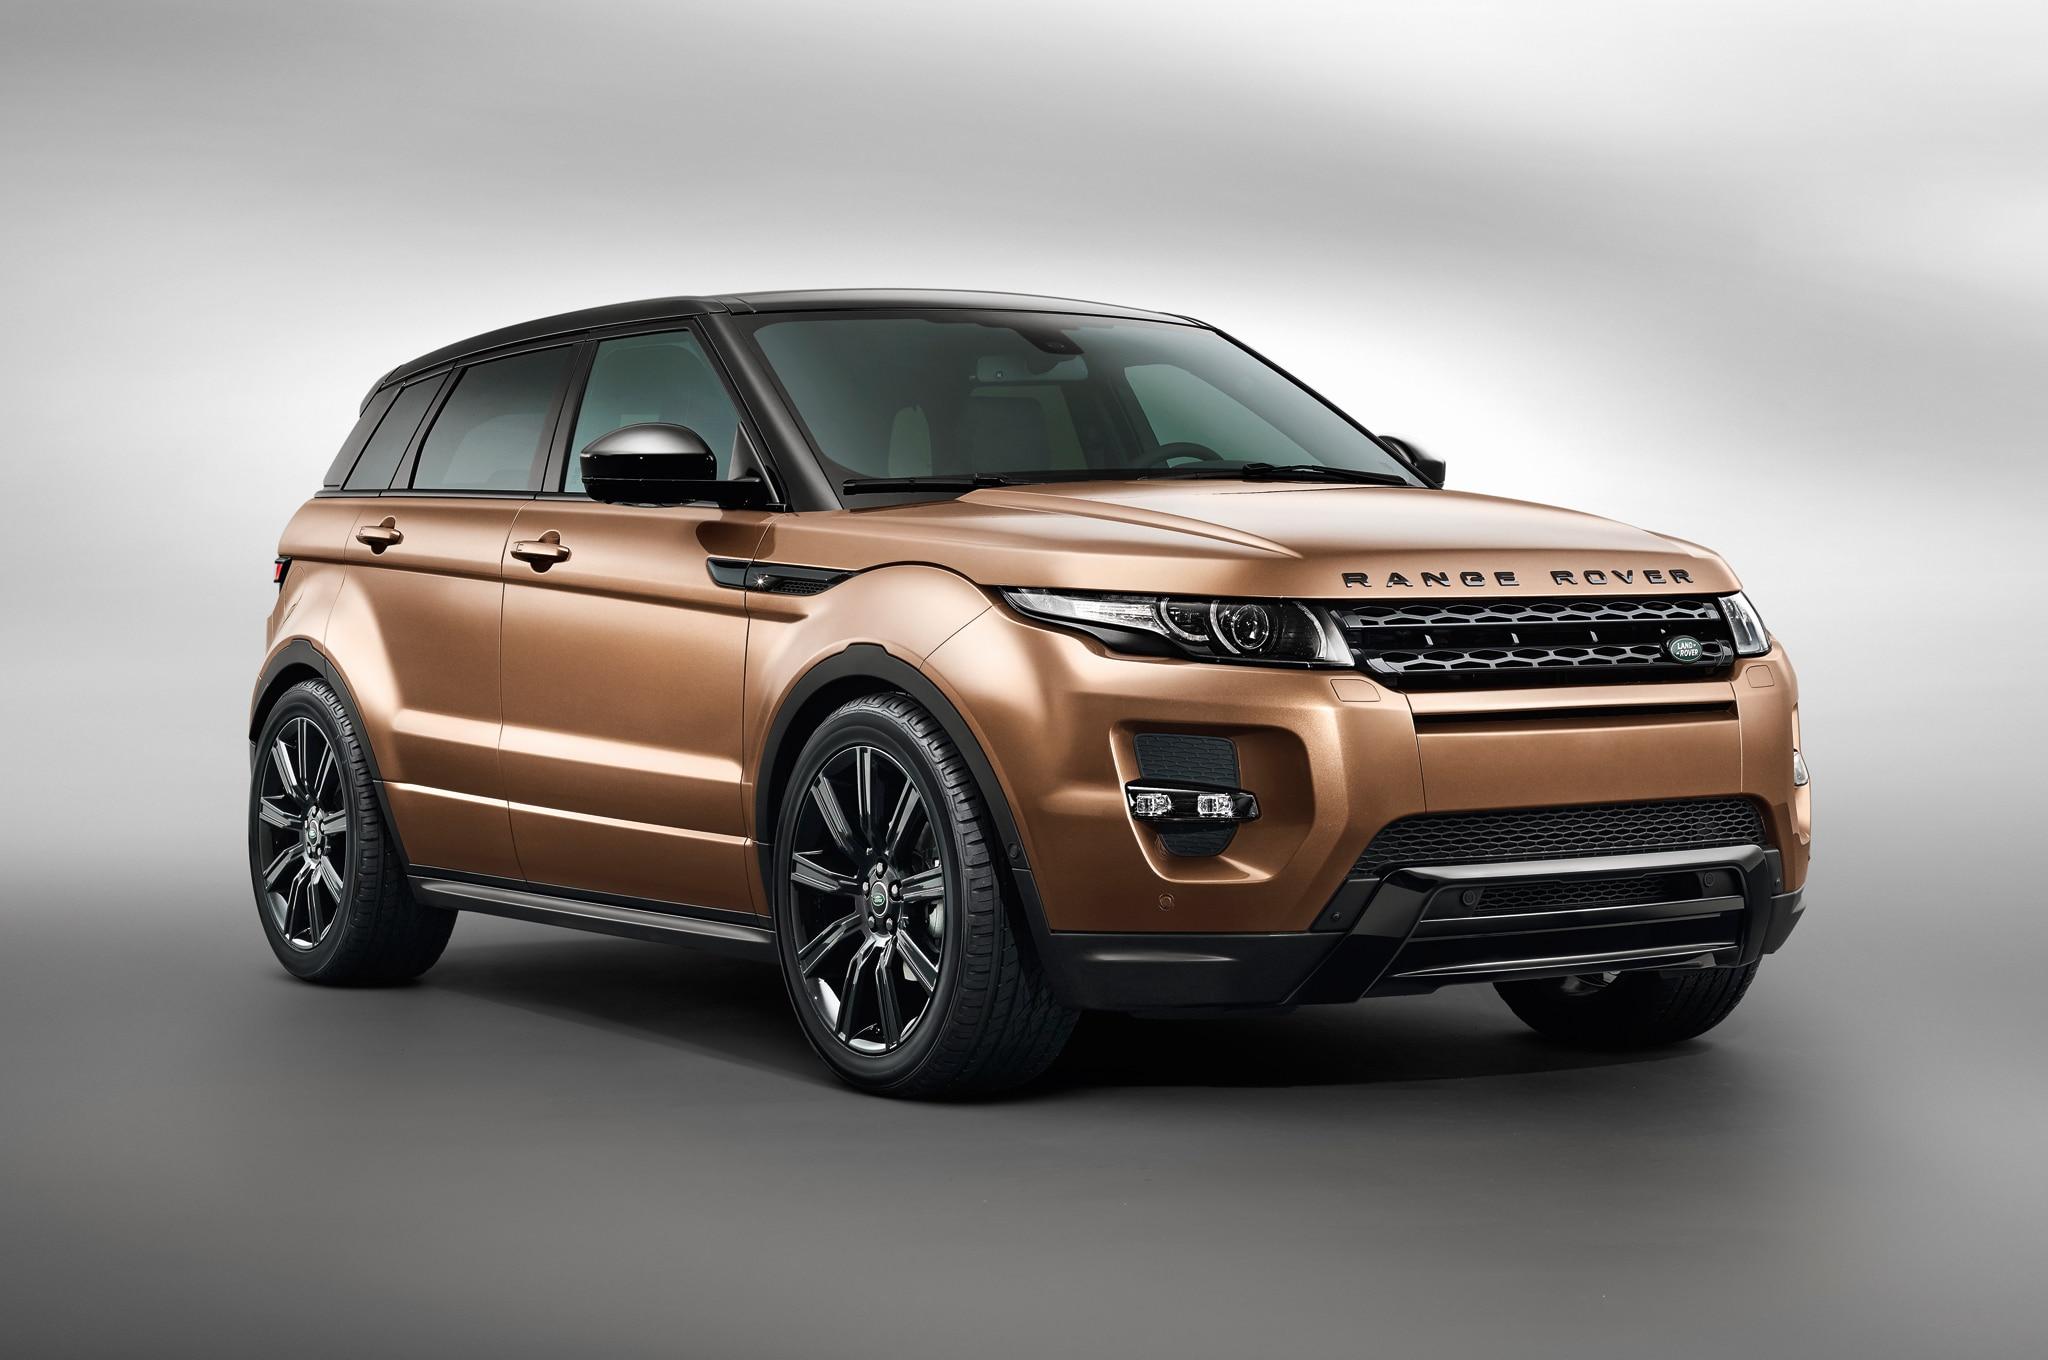 2014 Land Rover Range Rover Evoque: Around The Block